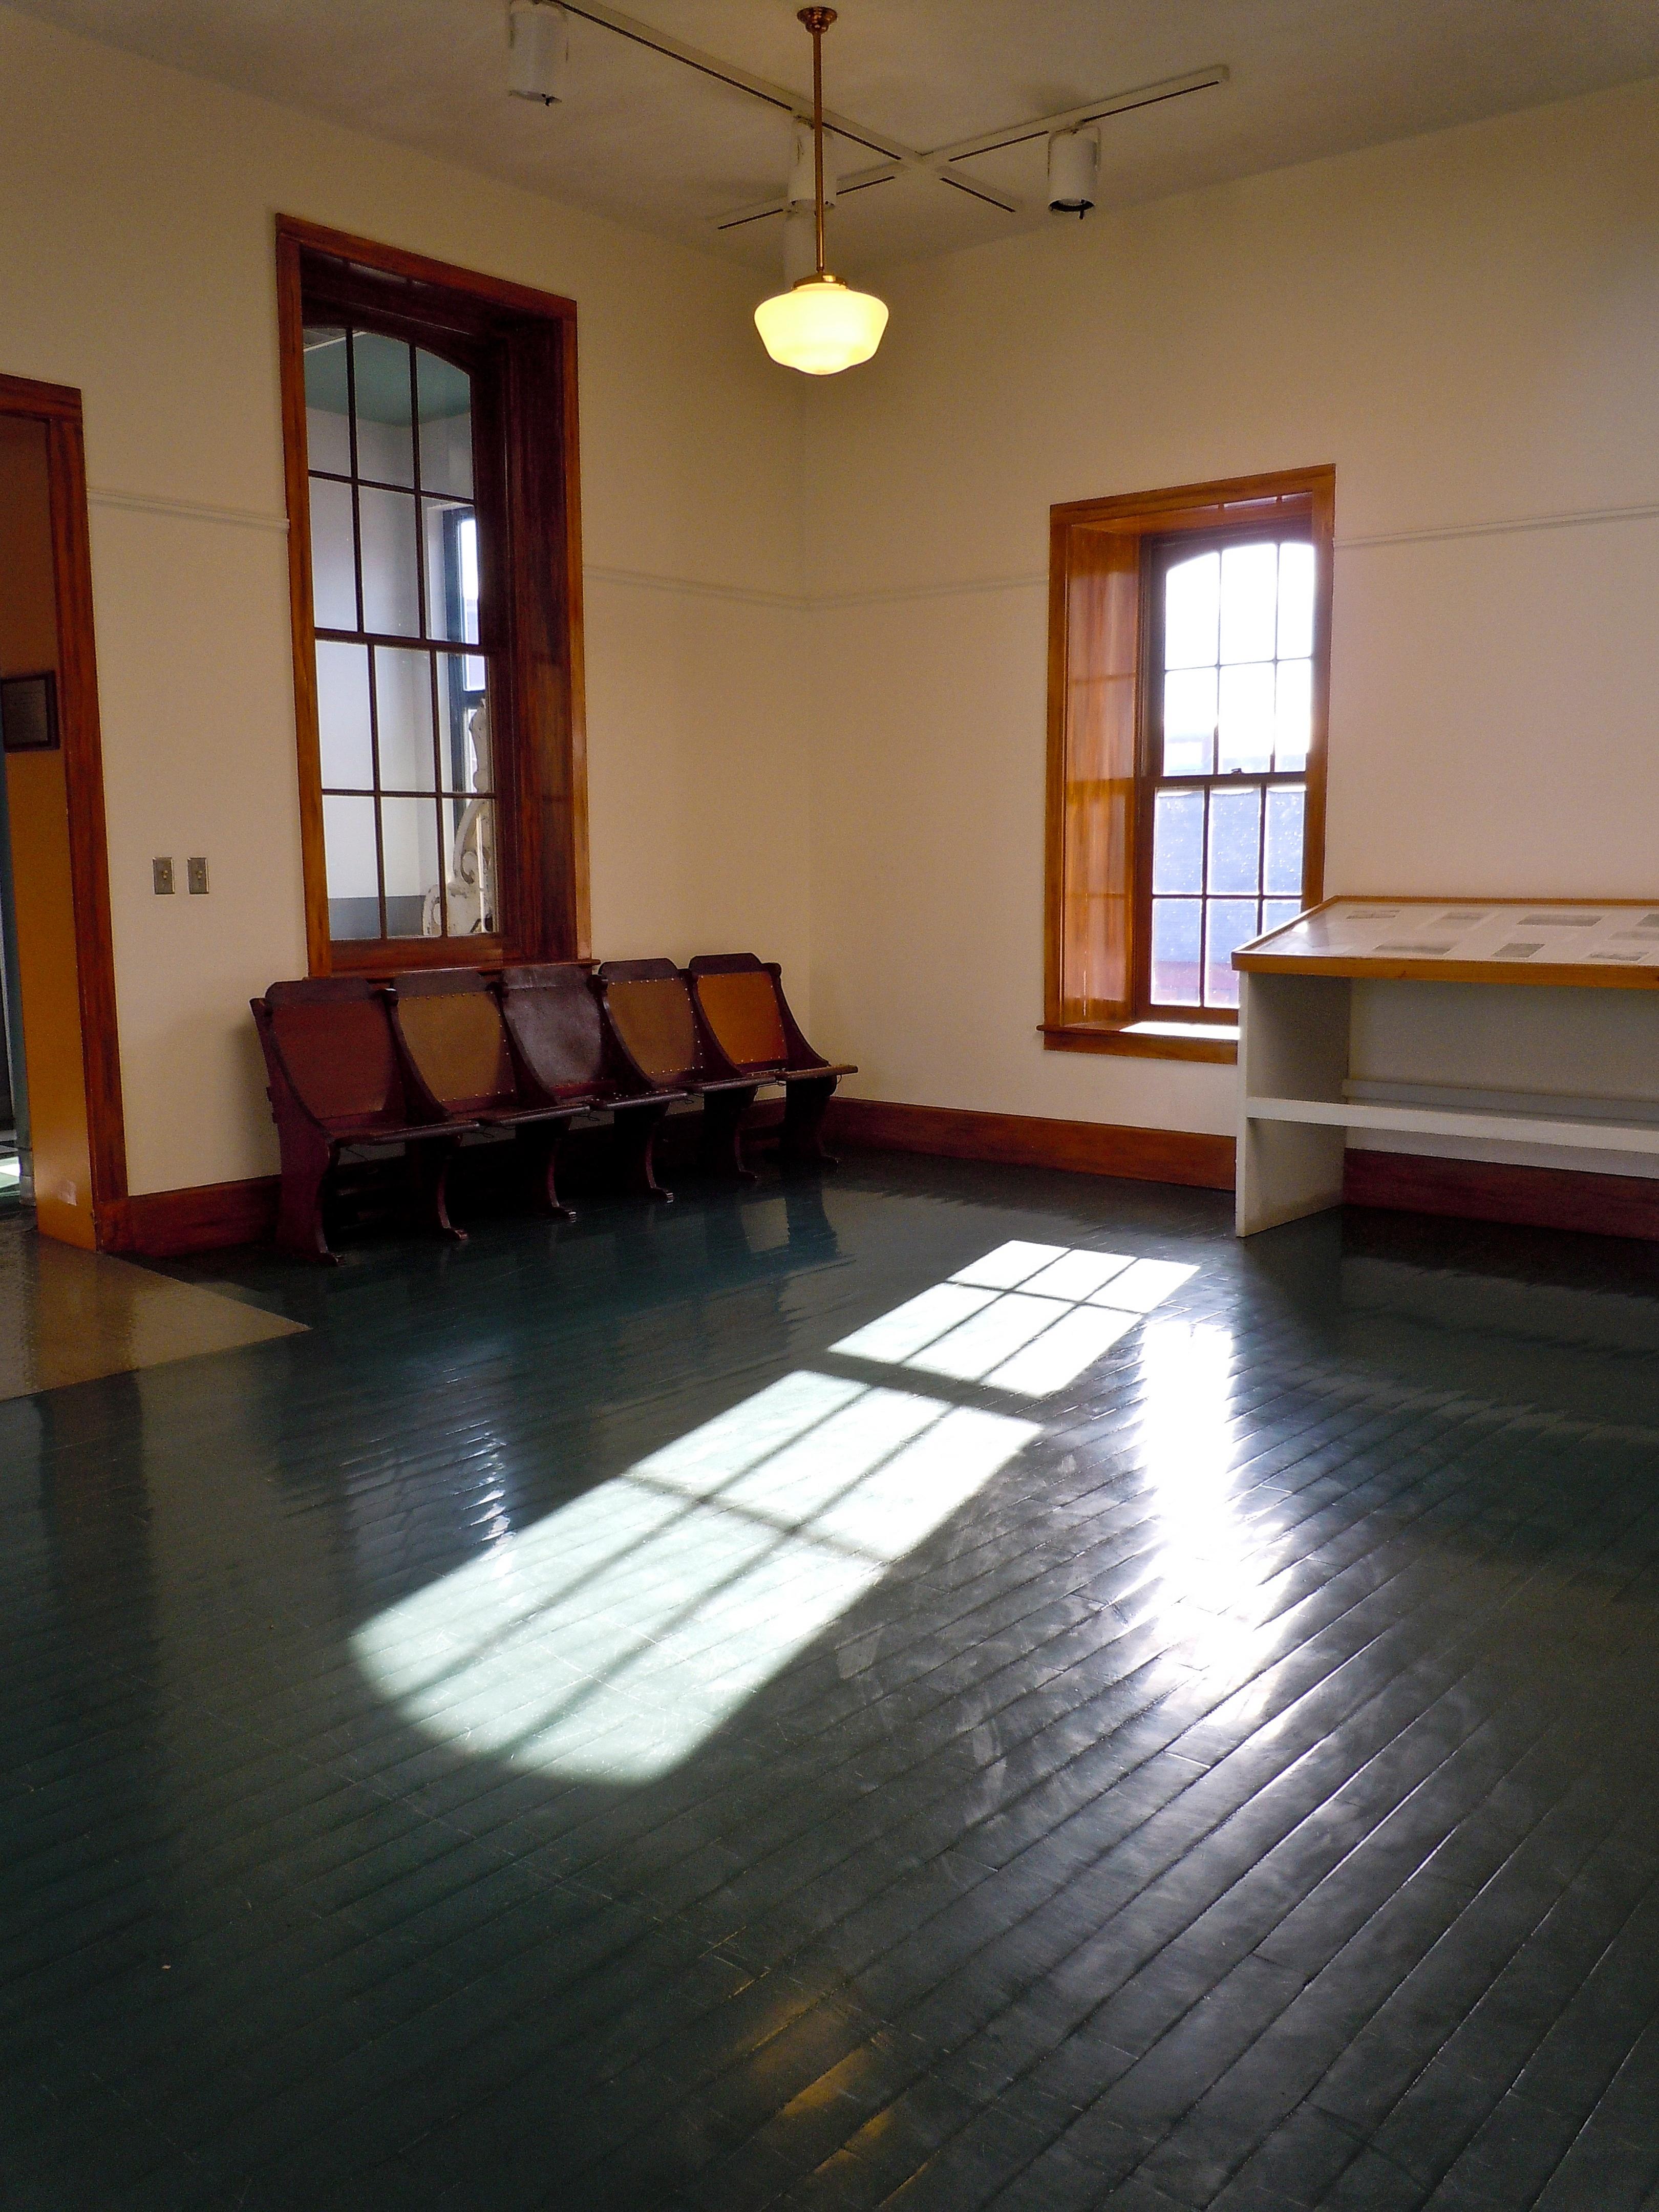 https://get.pxhere.com/photo/wood-house-floor-building-home-property-living-room-room-apartment-interior-design-hardwood-estate-real-estate-flooring-wood-flooring-4524.jpg